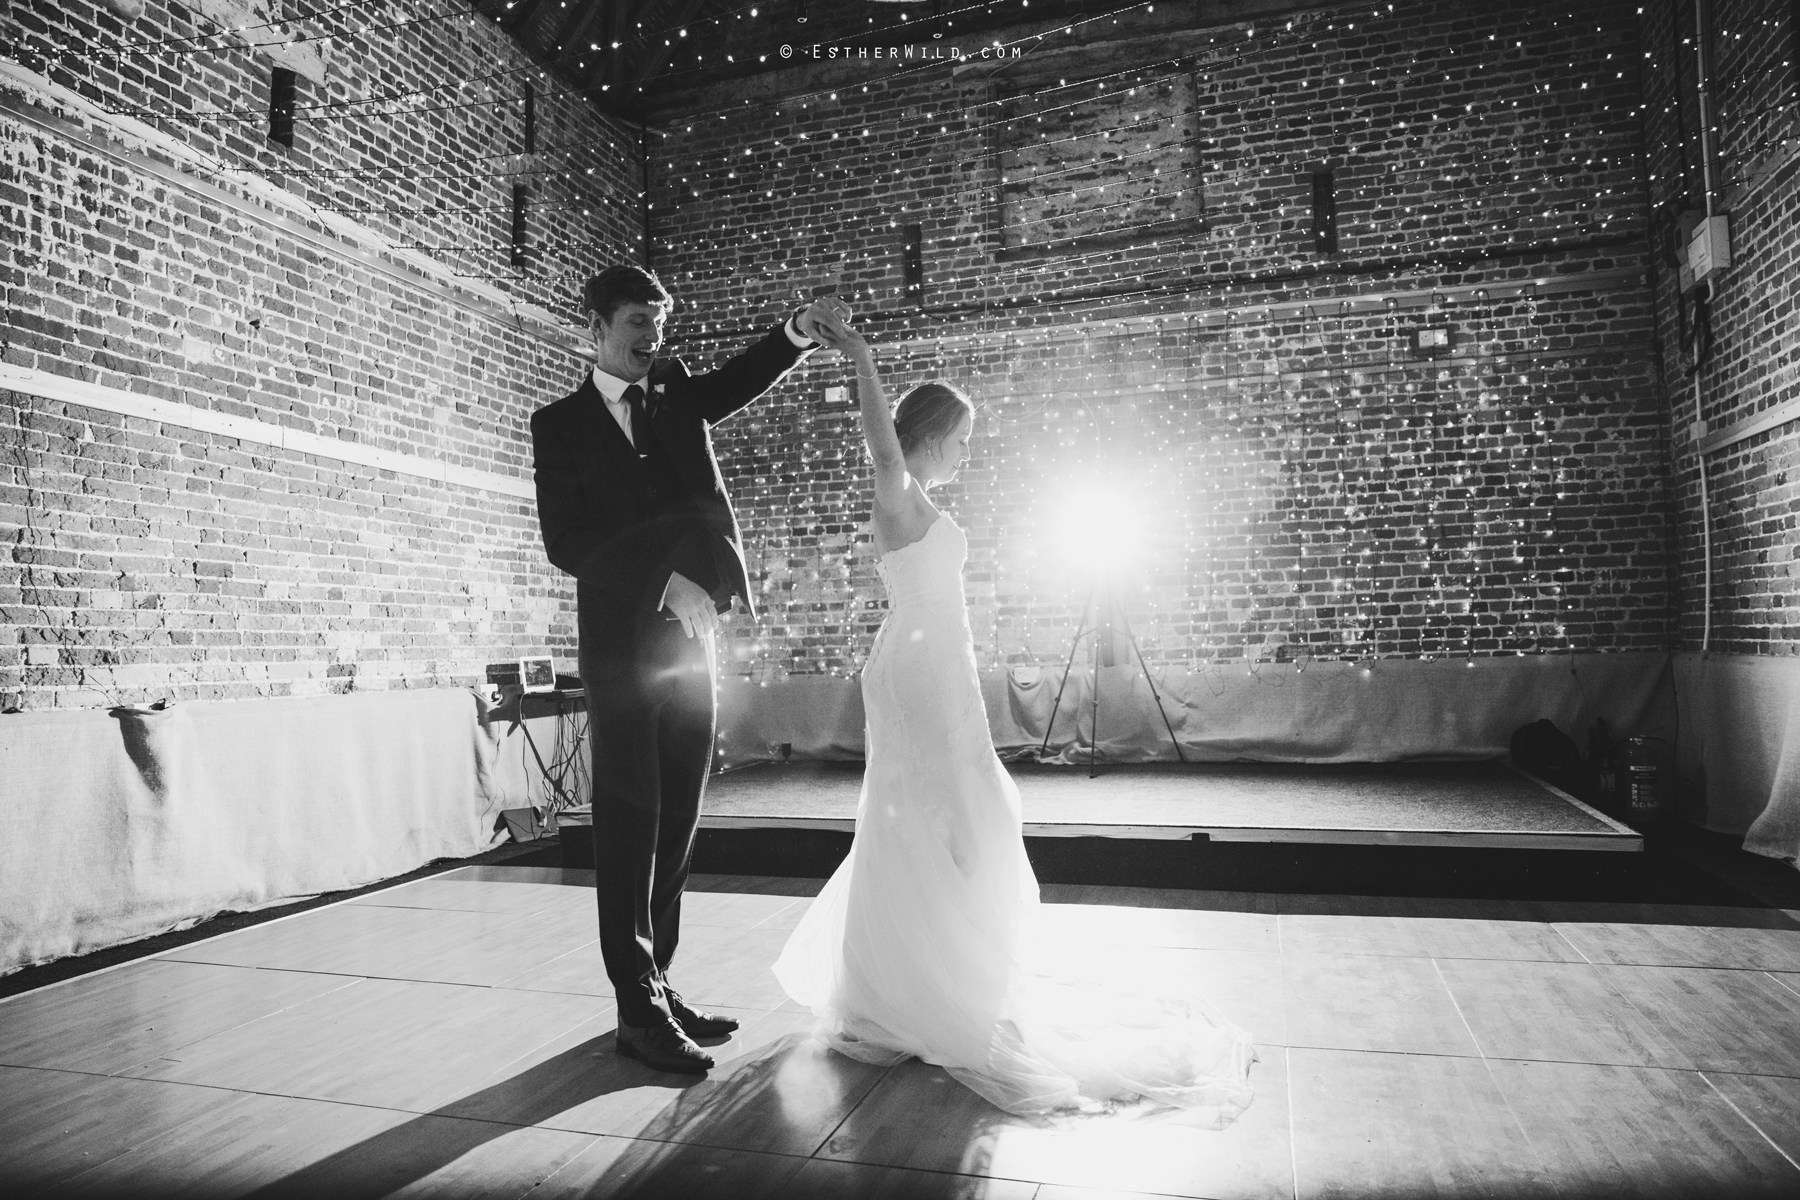 Glebe_Farm_Barn_Rustic_Norfolk_Wedding_Esther_Wild_Photographer_Copyright_IMG_2865-1.jpg